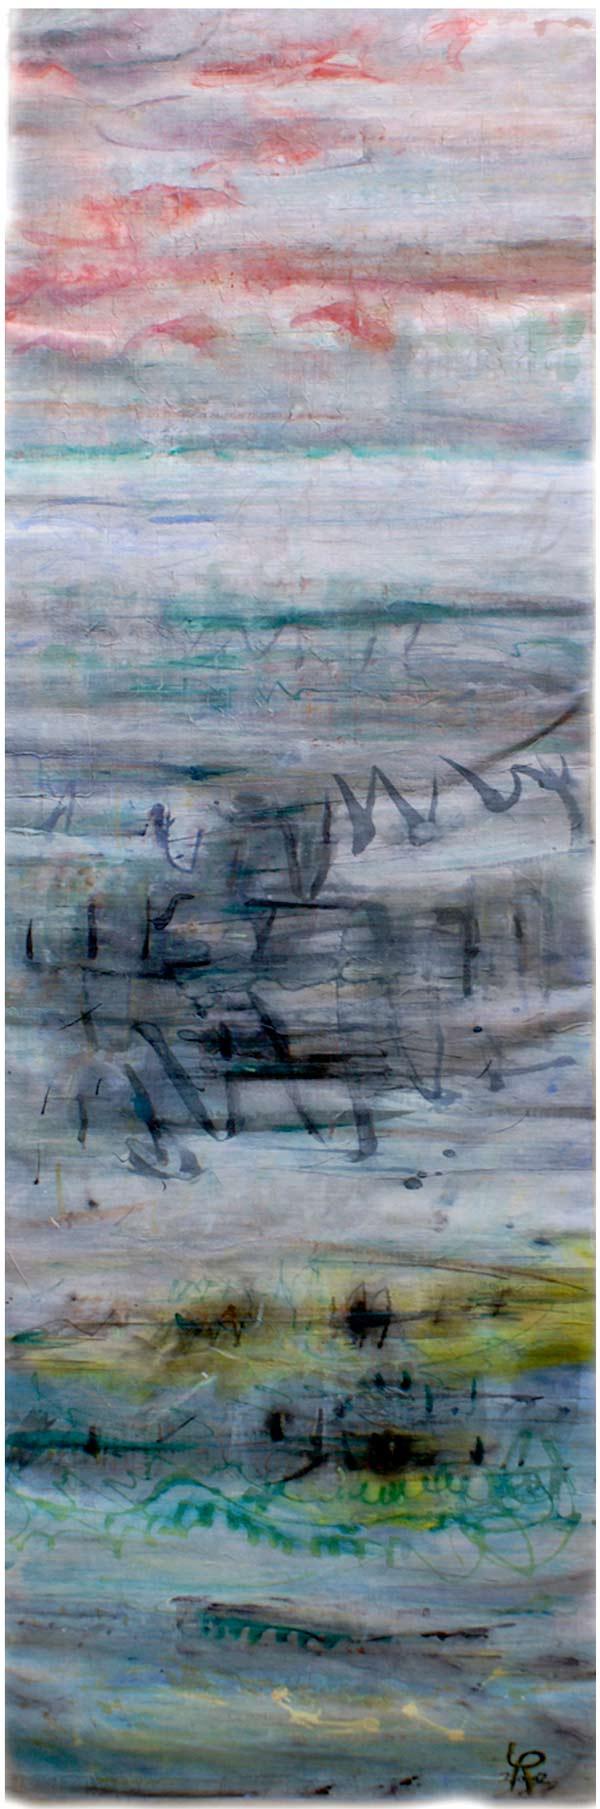 Ritmo de la mar  , 2002